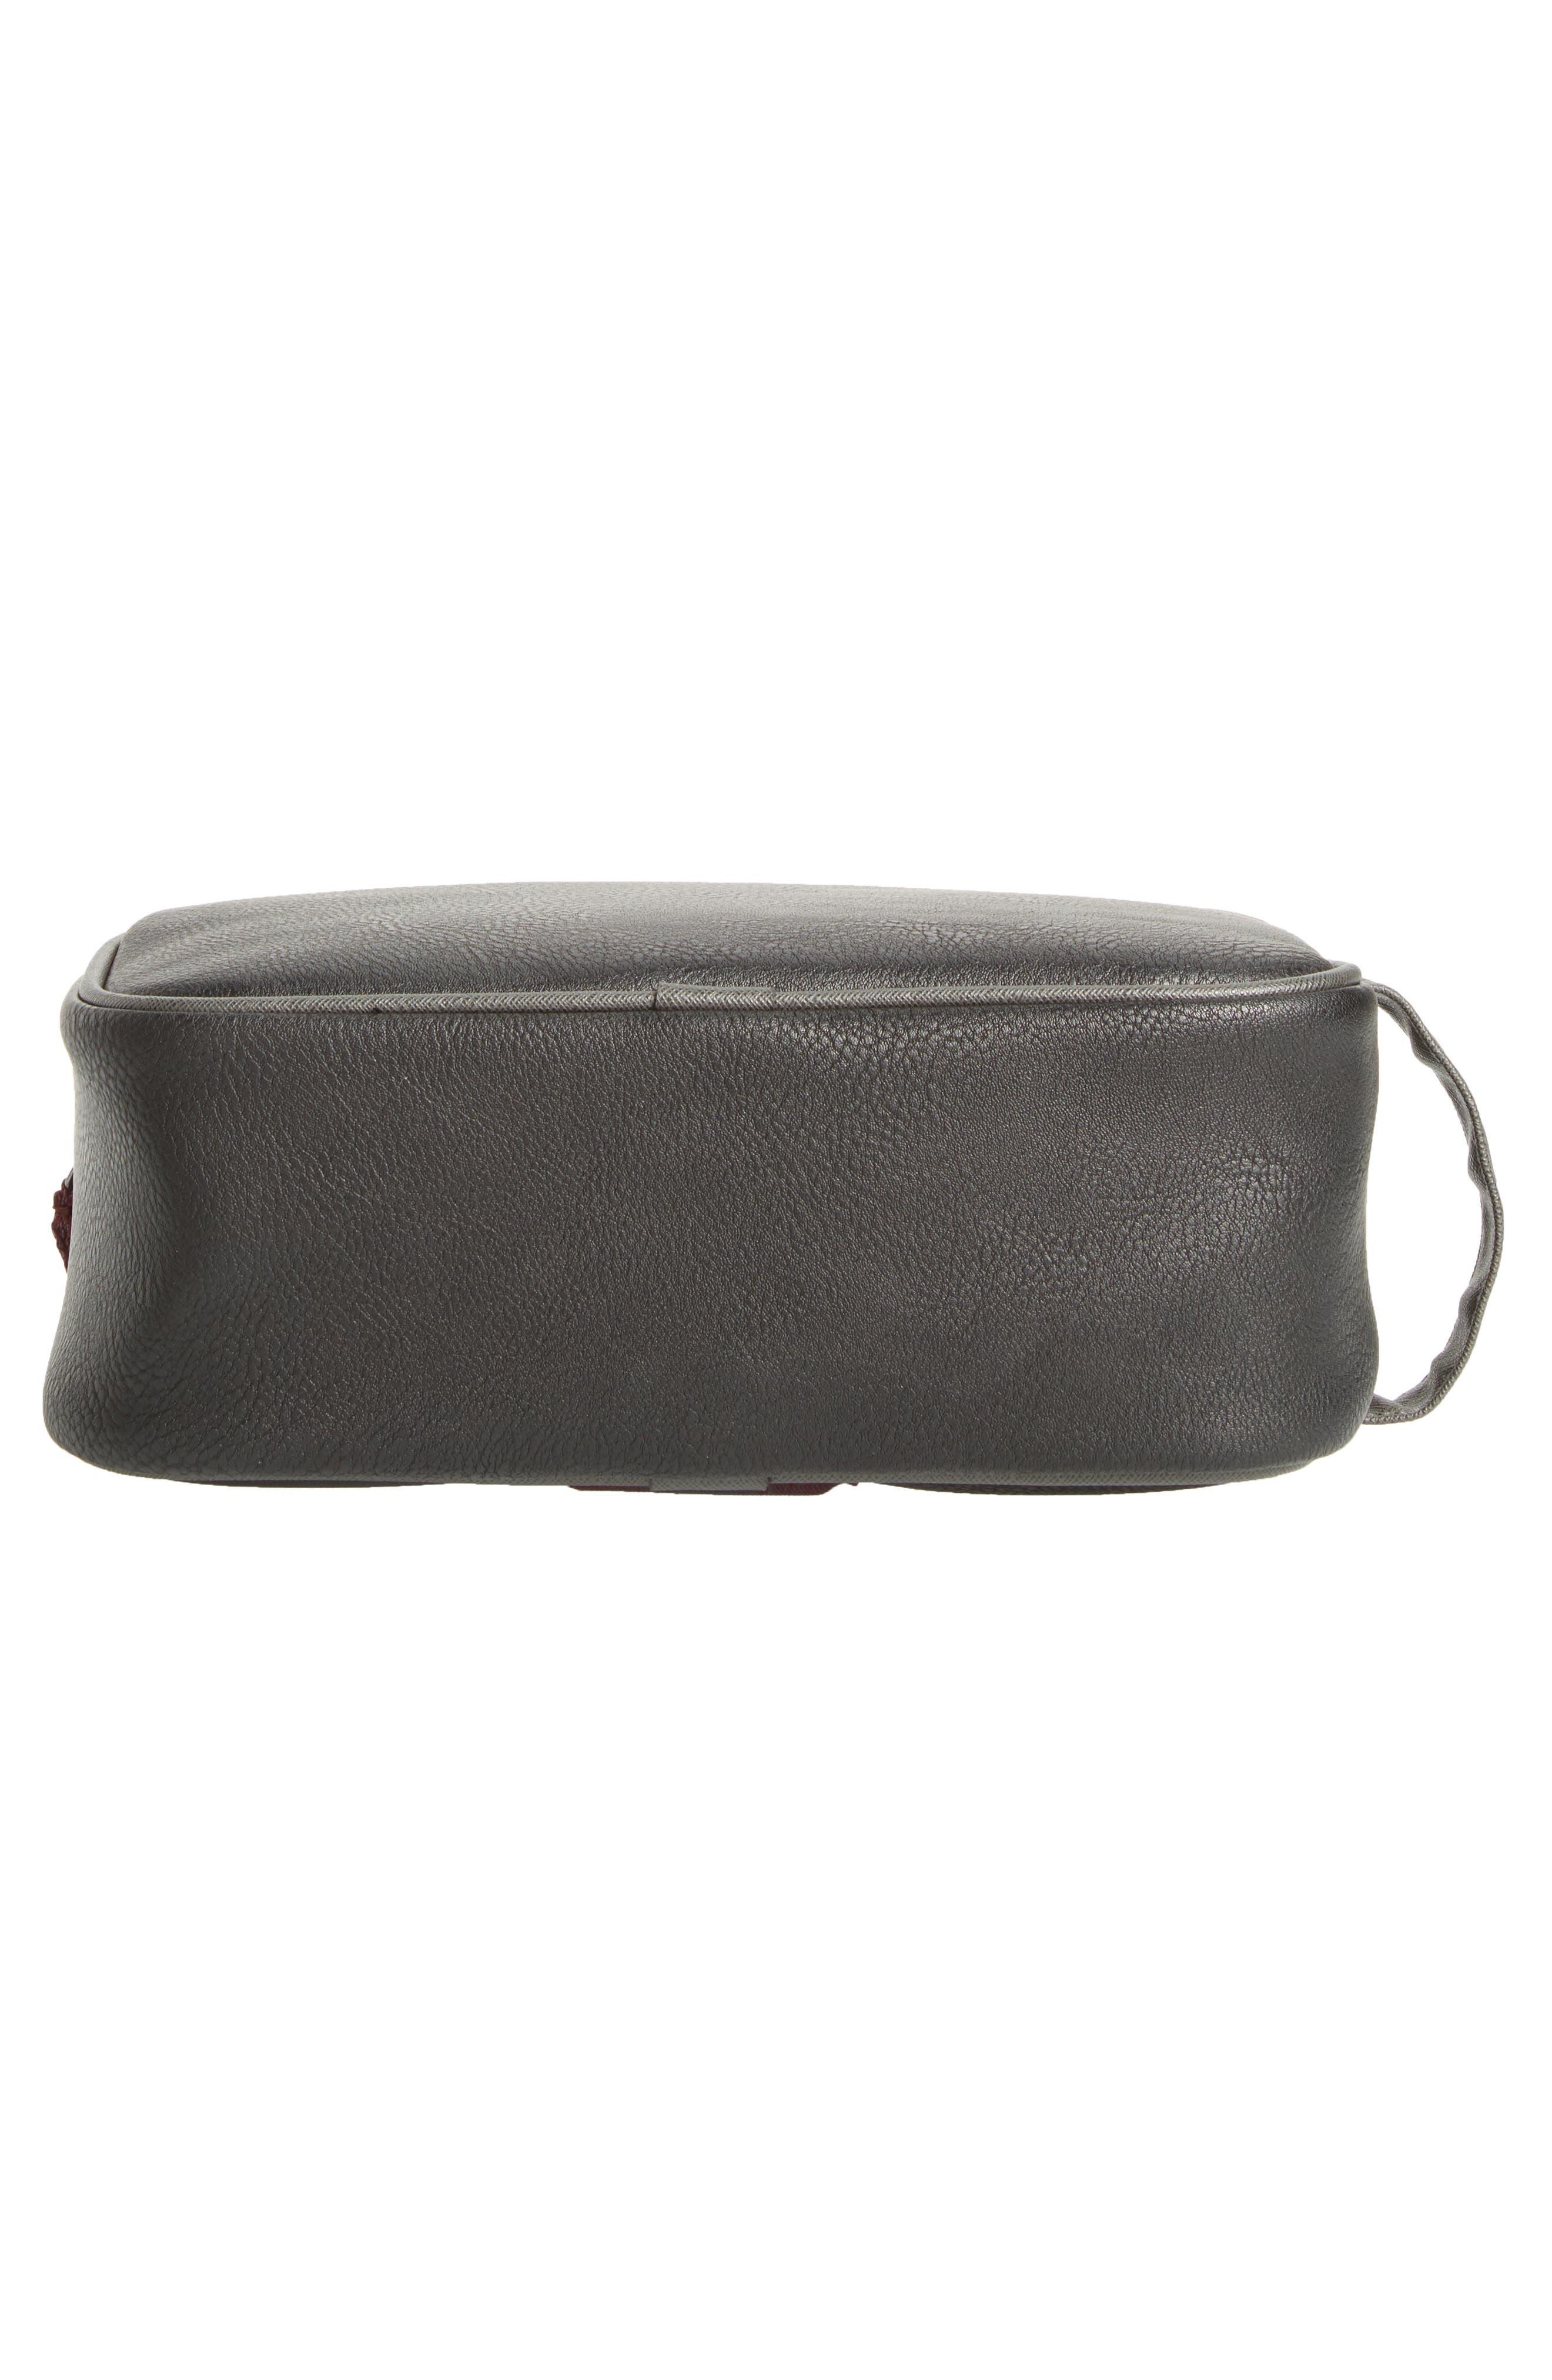 Pidgy Faux Leather Travel Kit,                             Alternate thumbnail 5, color,                             001